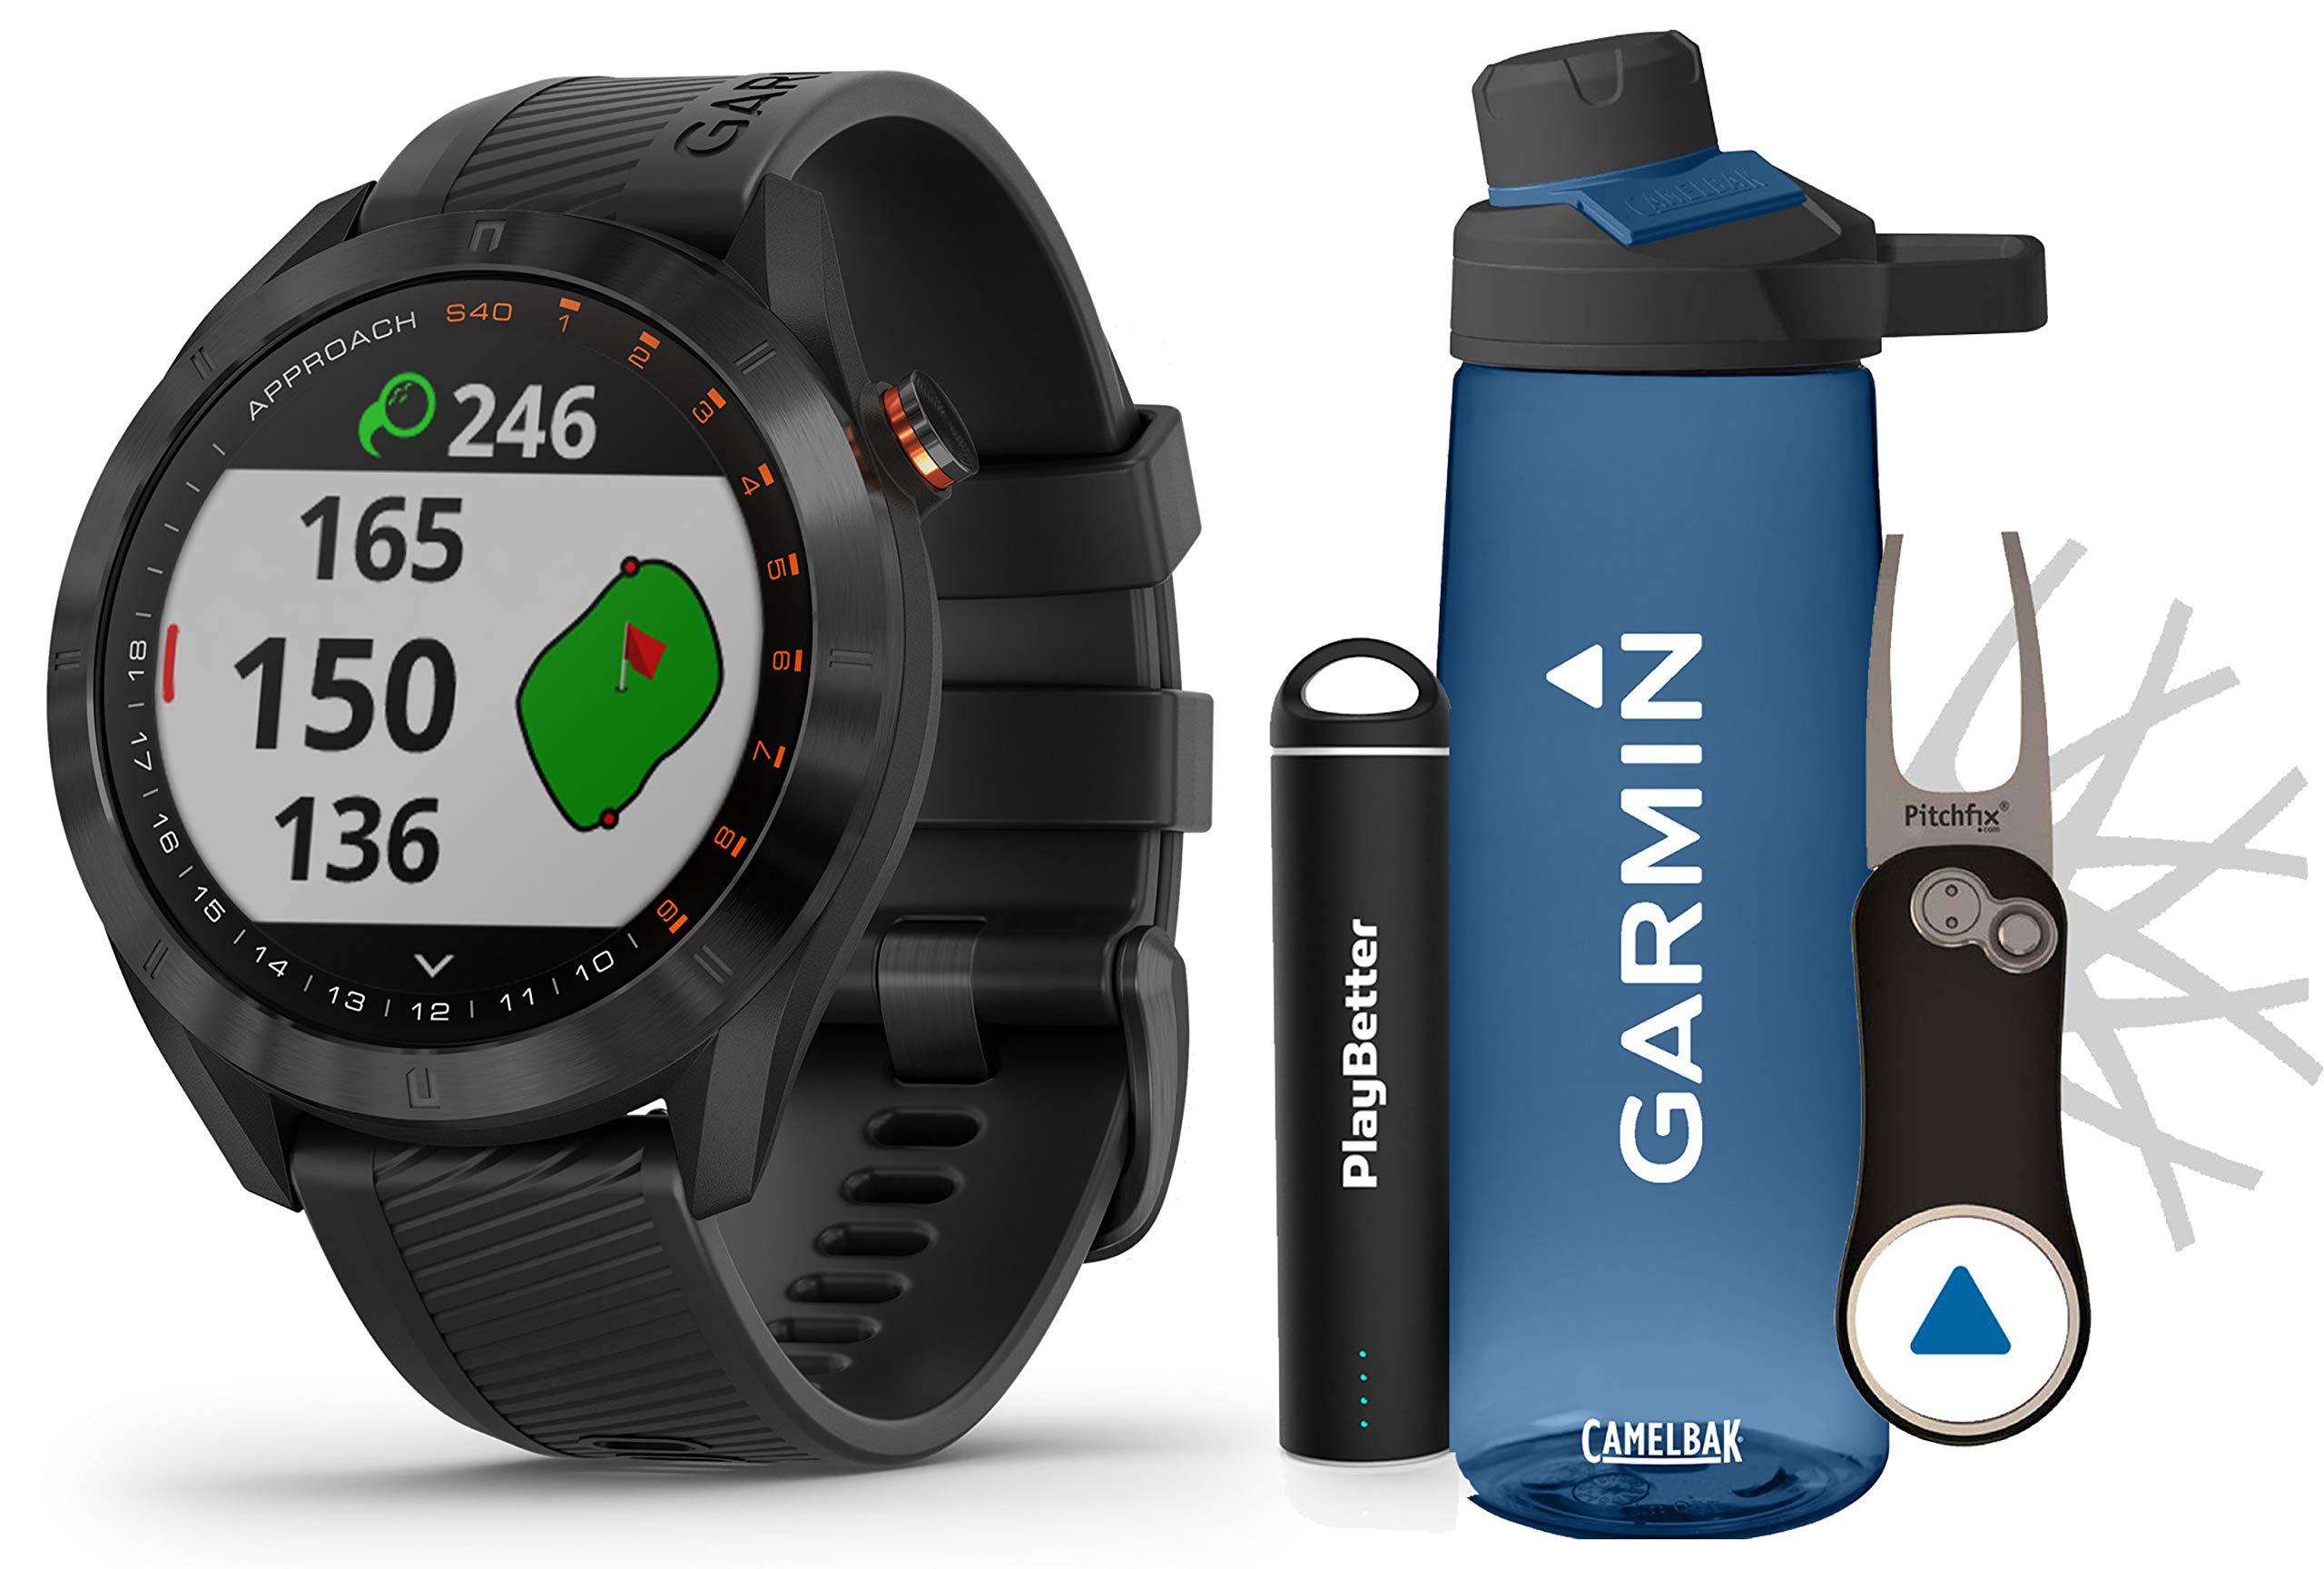 Garmin Approach S40 (Black) Golf GPS Smartwatch Premium Gift Set Bundle   +HD Screen Protectors, Garmin/PlayBetter Premium Water Bottle, Pitchfix Divot Tool & Portable Charger   41,000+ Courses